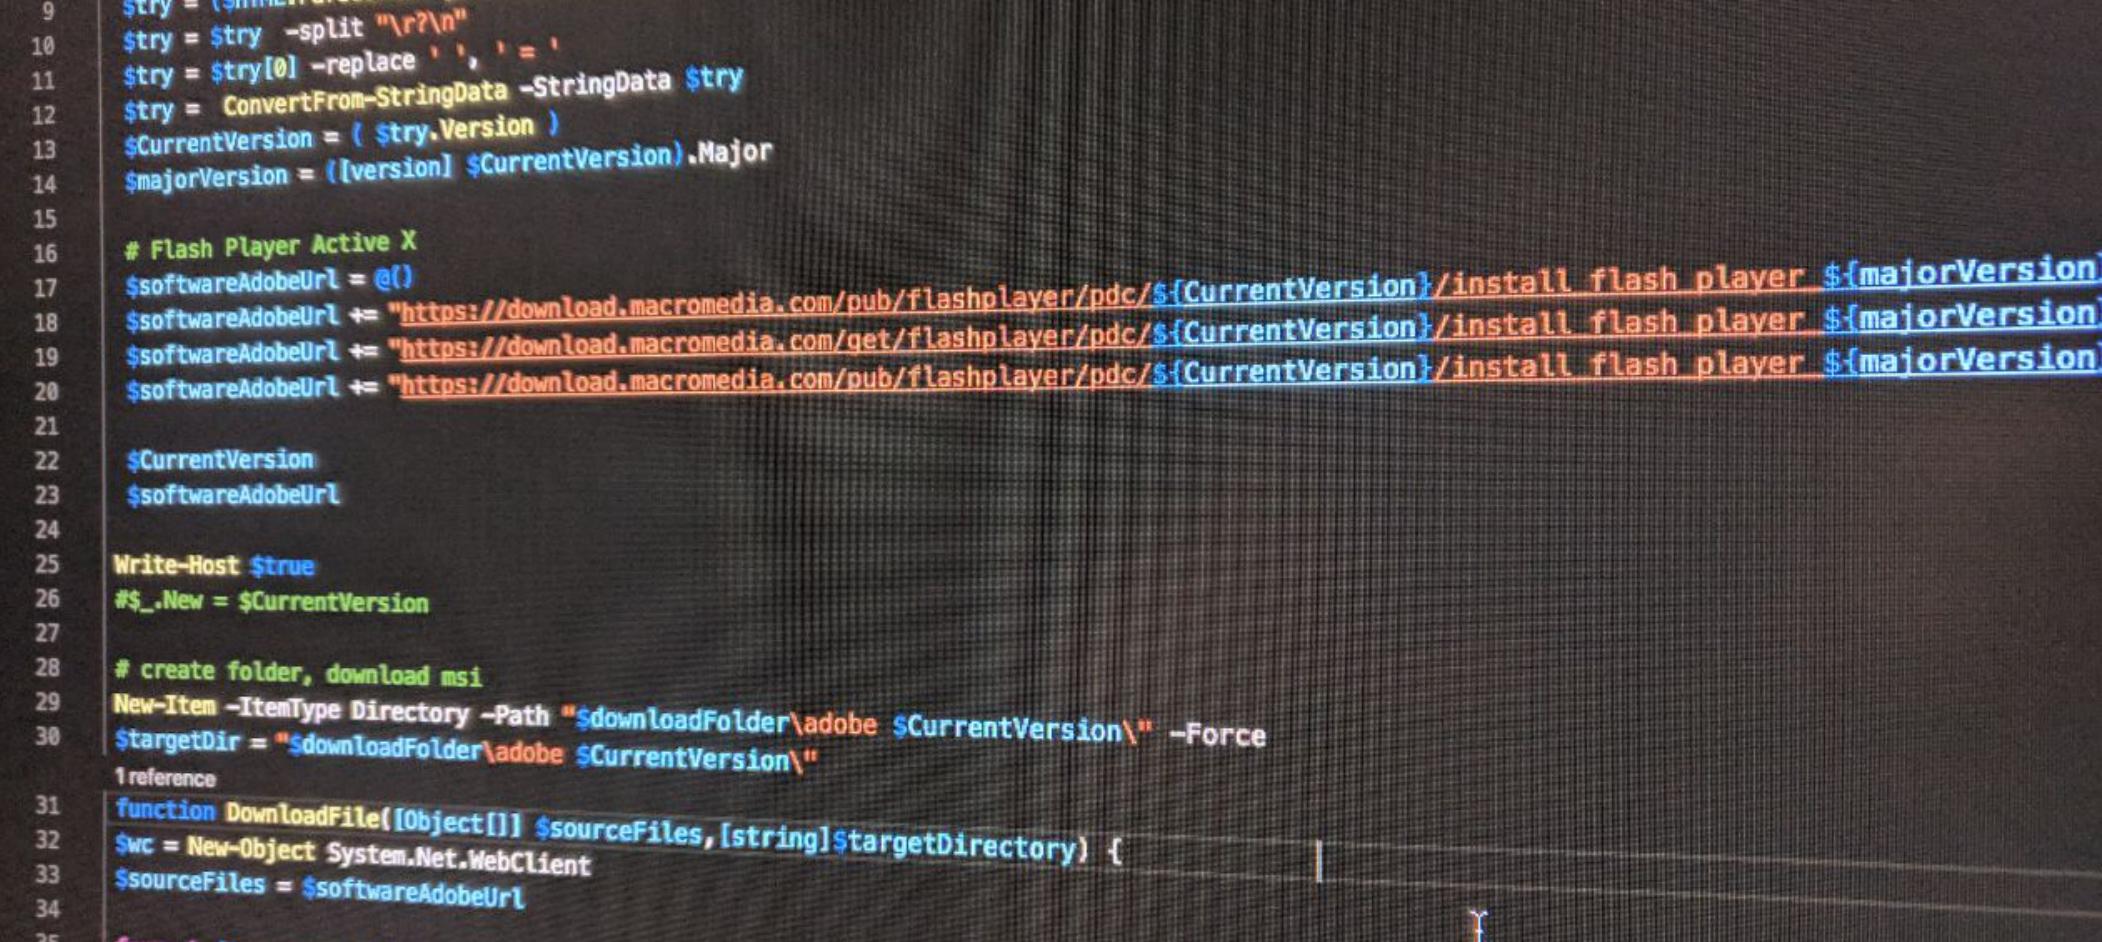 Как скачать msi файлы для adobe flash через powershell | anton masyan.